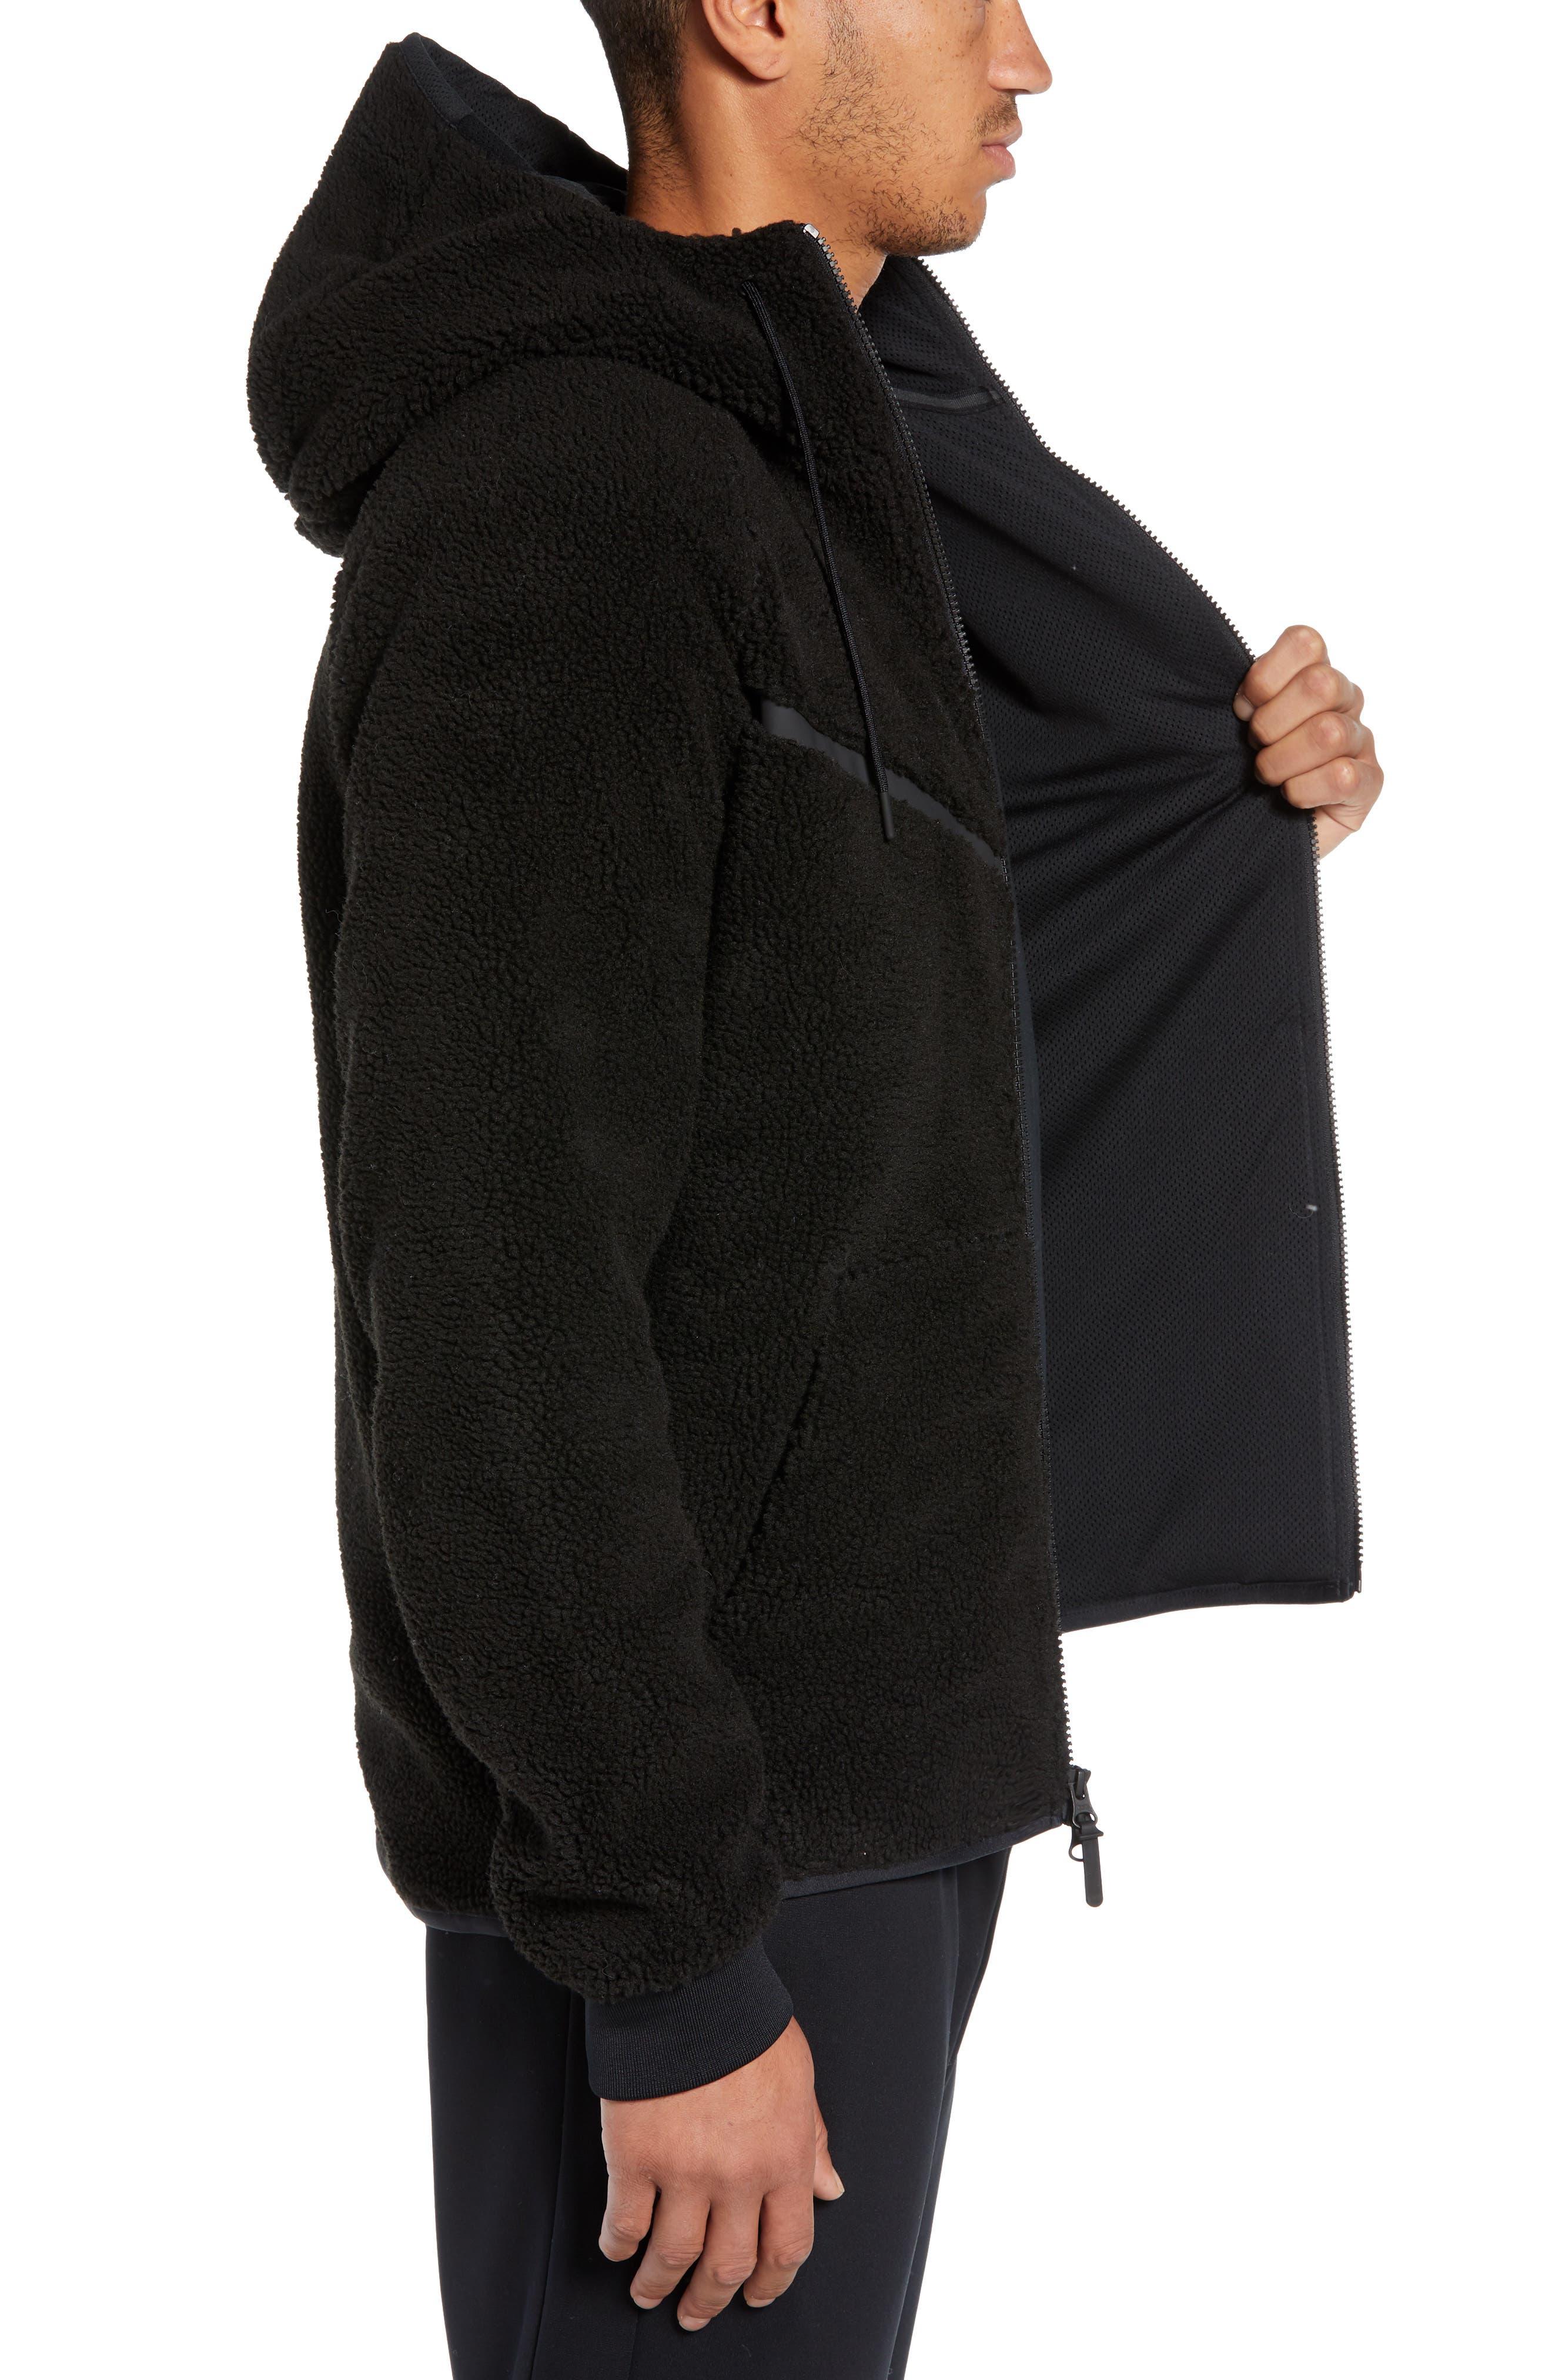 NIKE, Tech Icon Fleece Zip Hoodie, Alternate thumbnail 4, color, BLACK/ BLACK